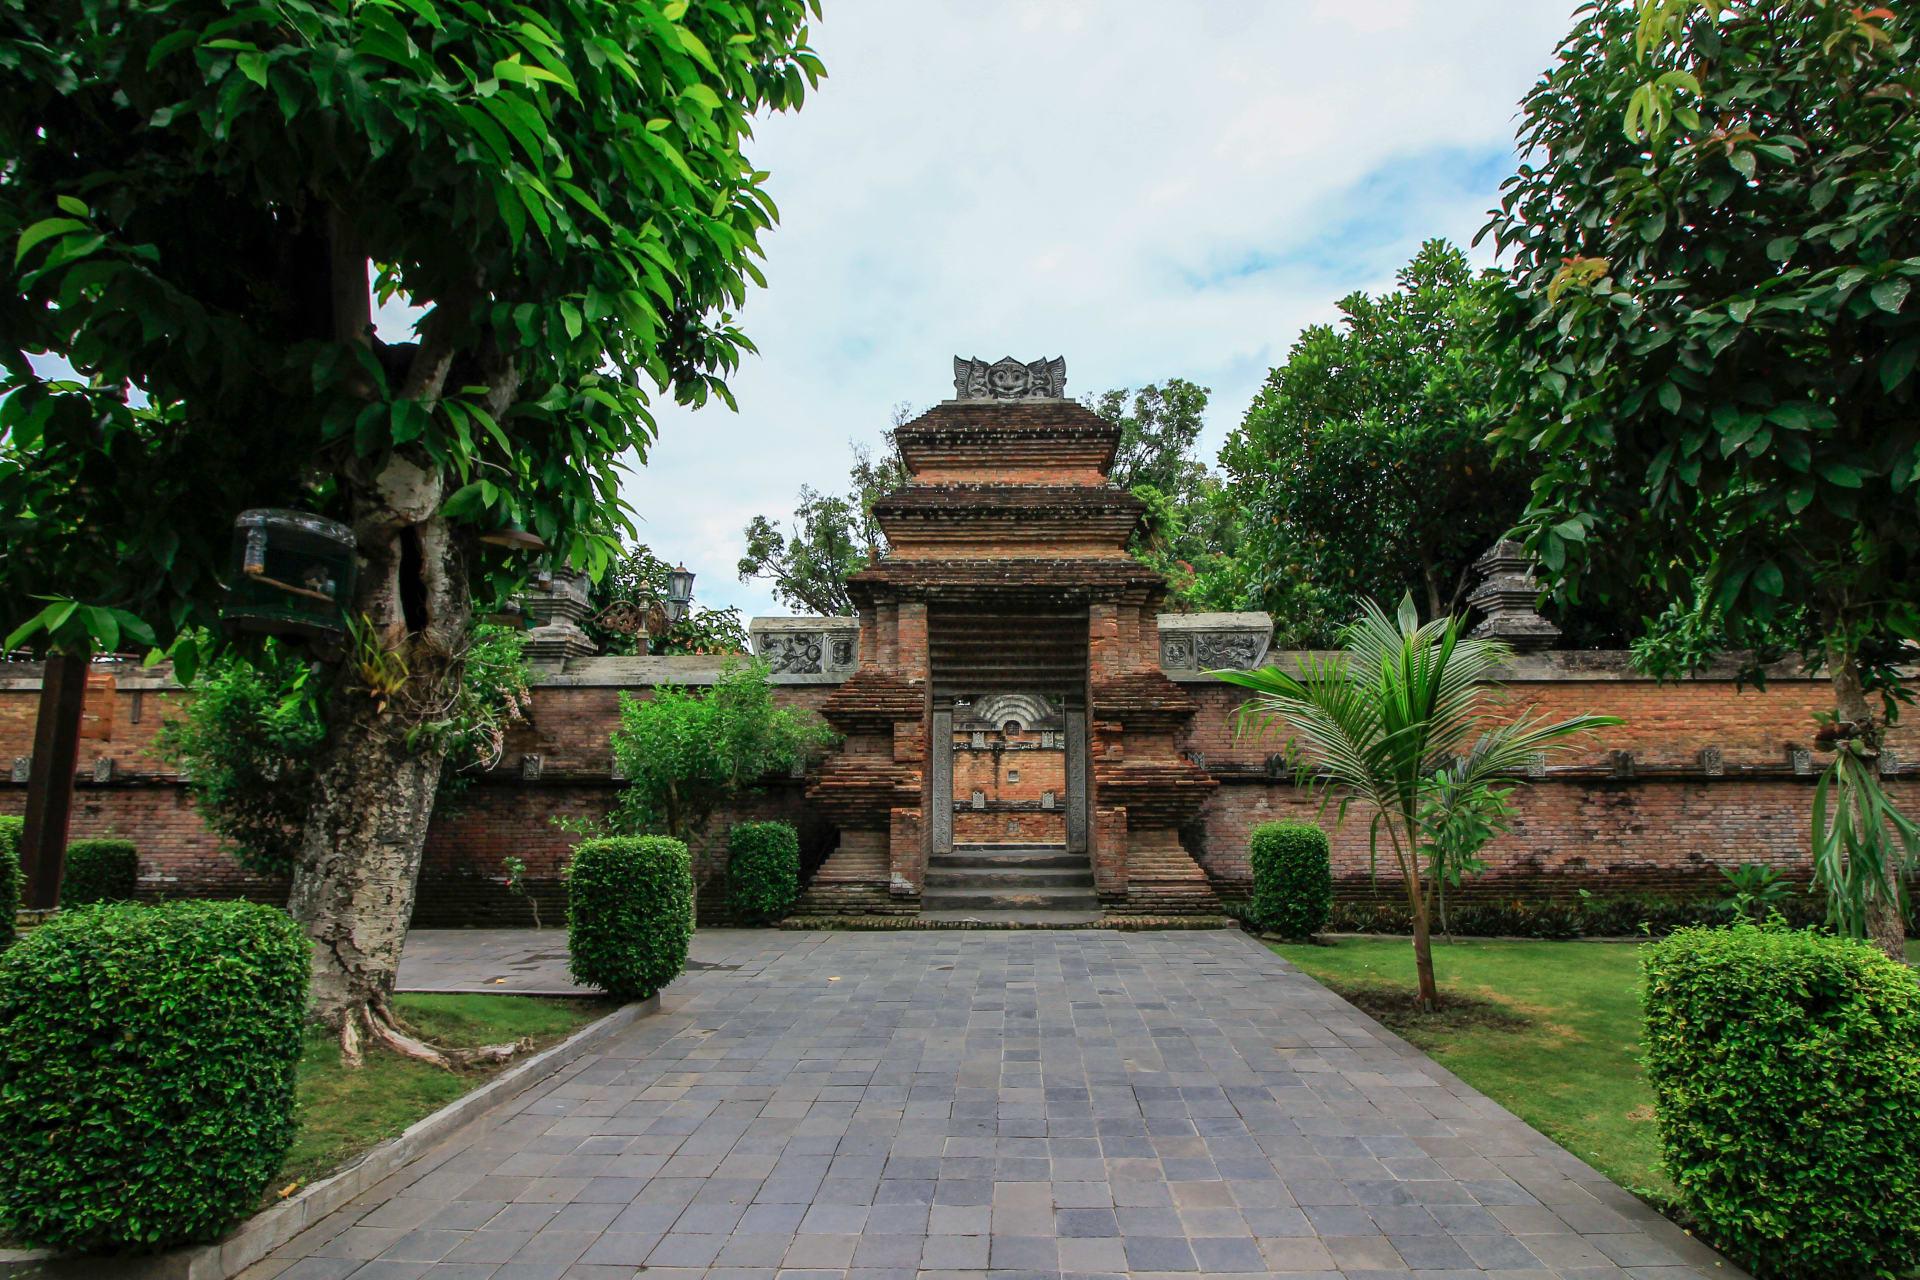 Yogyakarta - The Heritage Walk of Kotagede in Yogyakarta